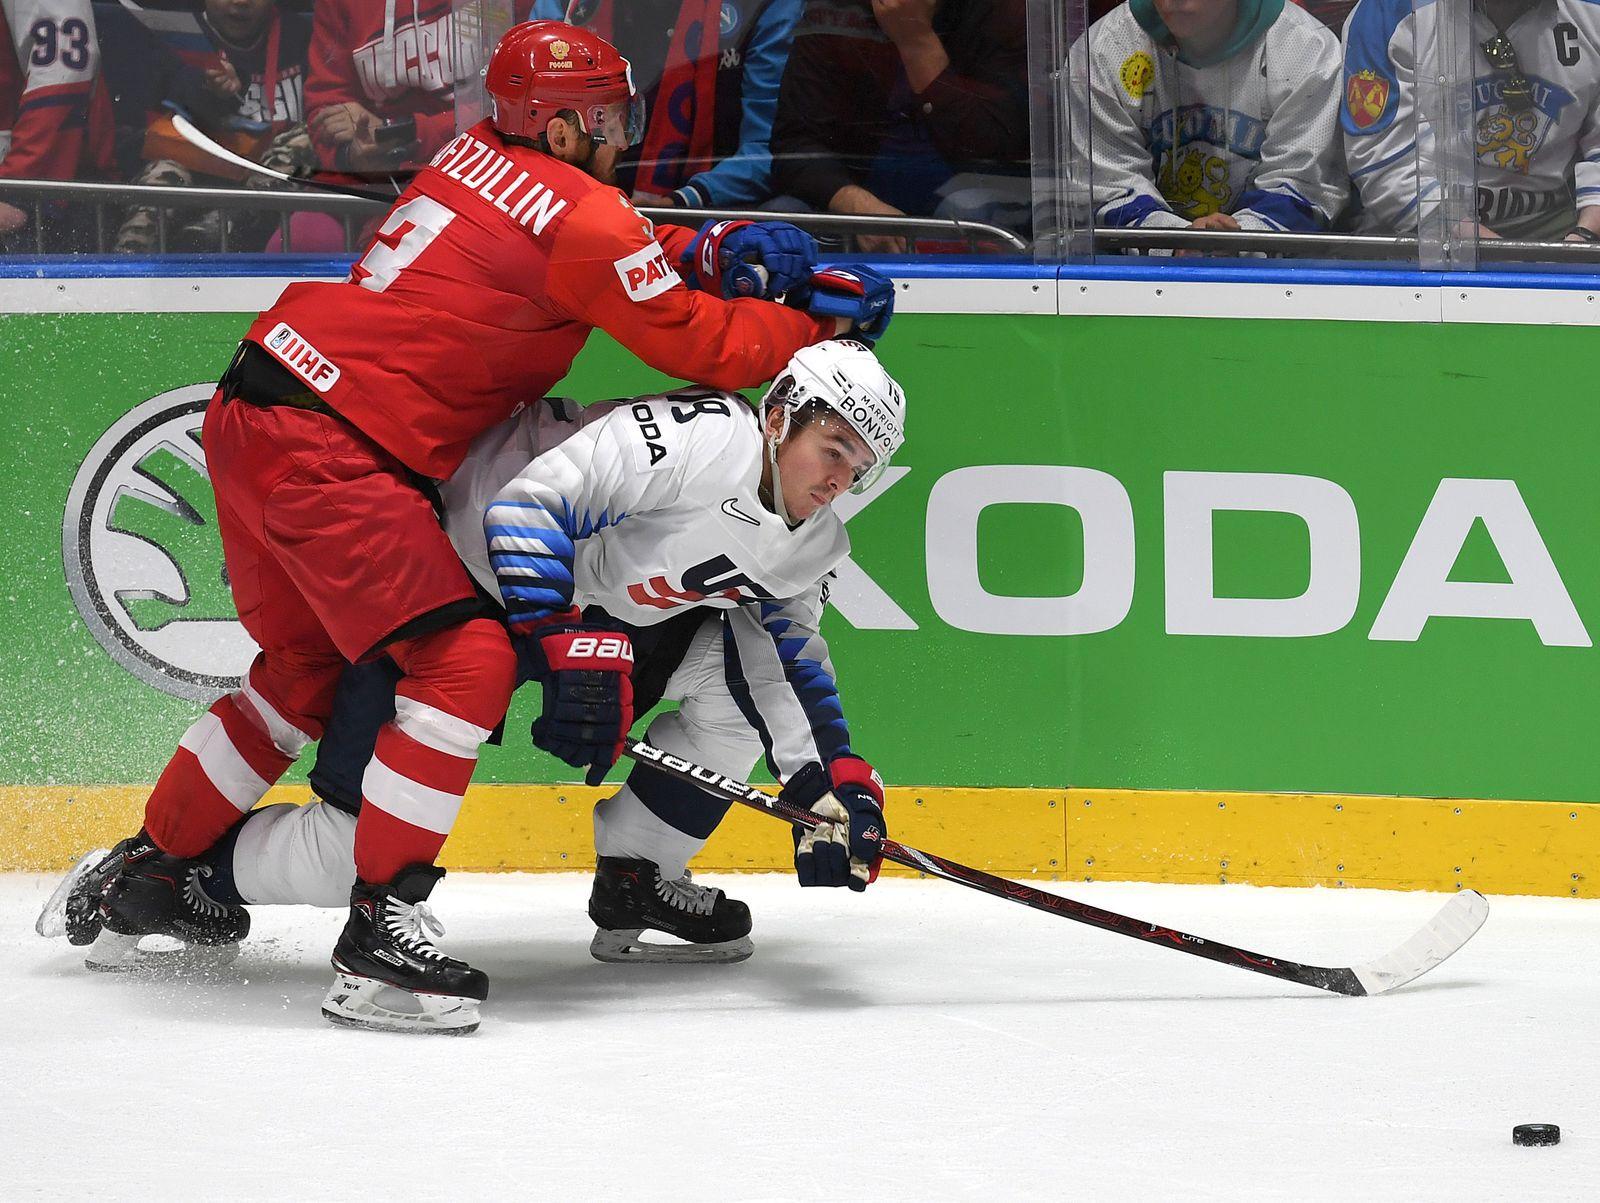 Eishockey-WM - Skoda